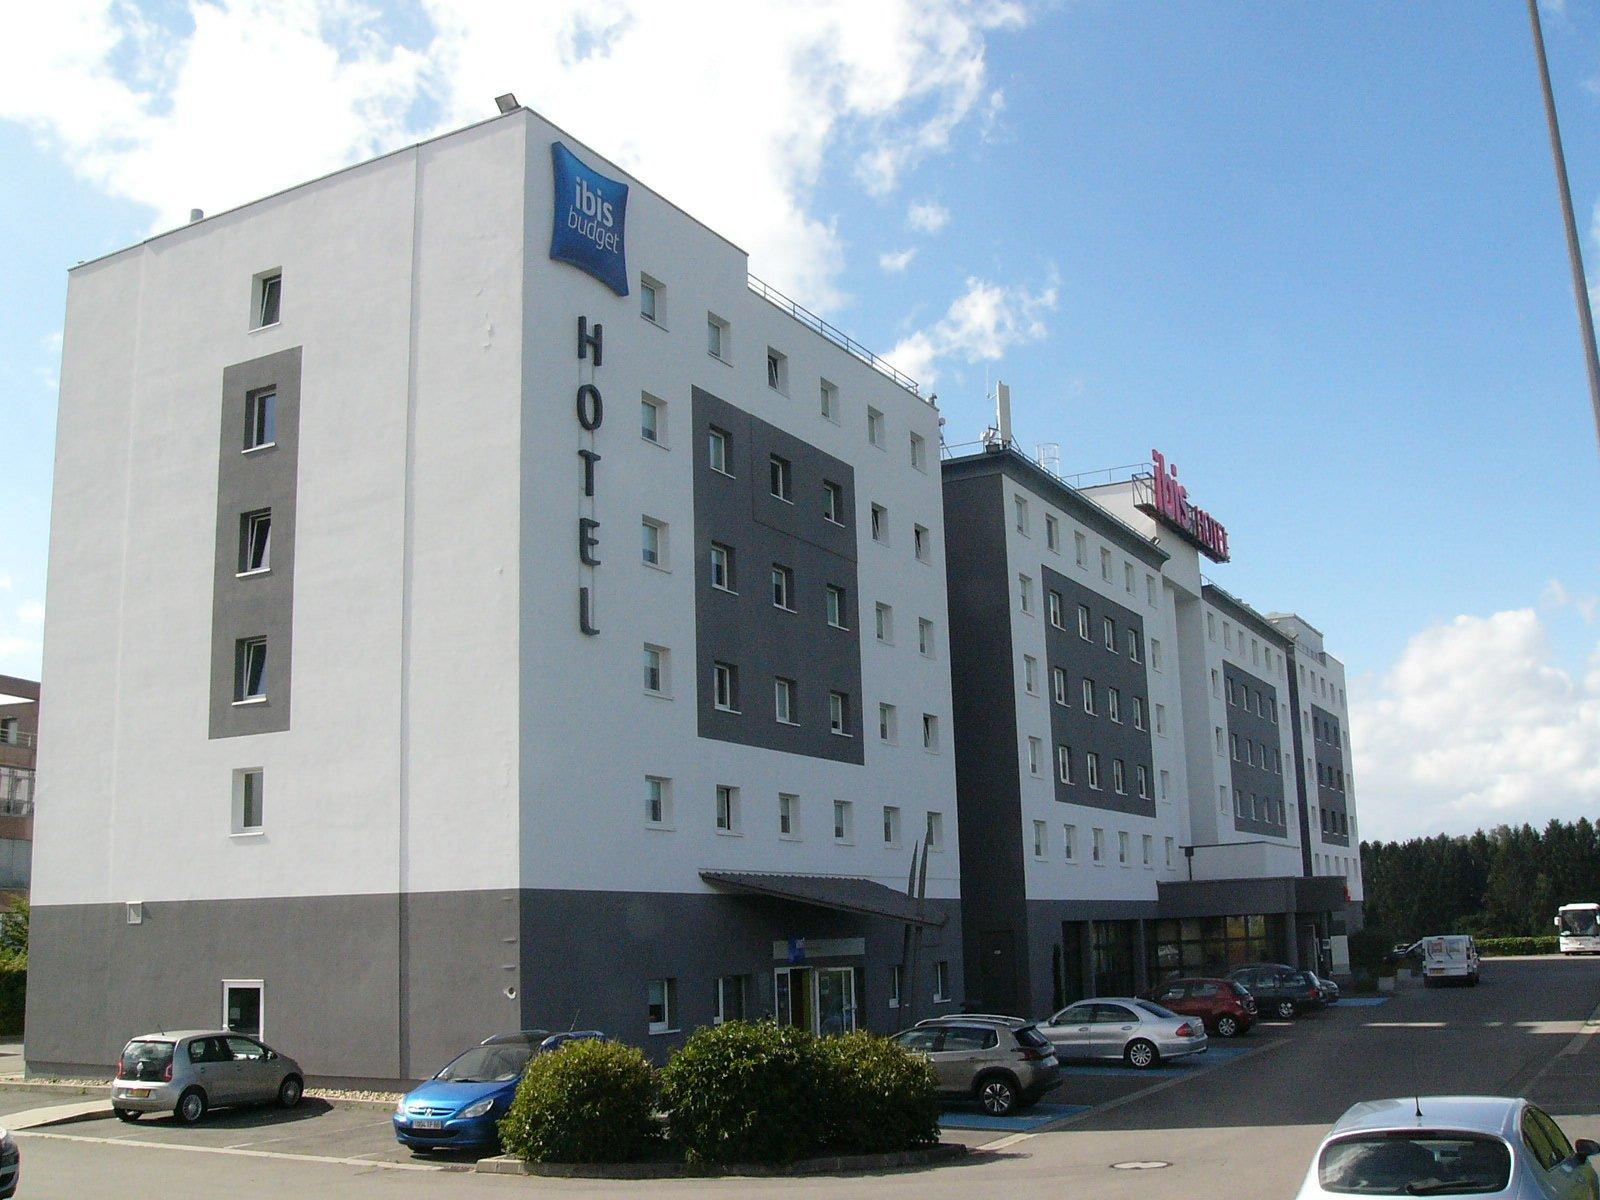 Ibis Budget Luxembourg Aeroport